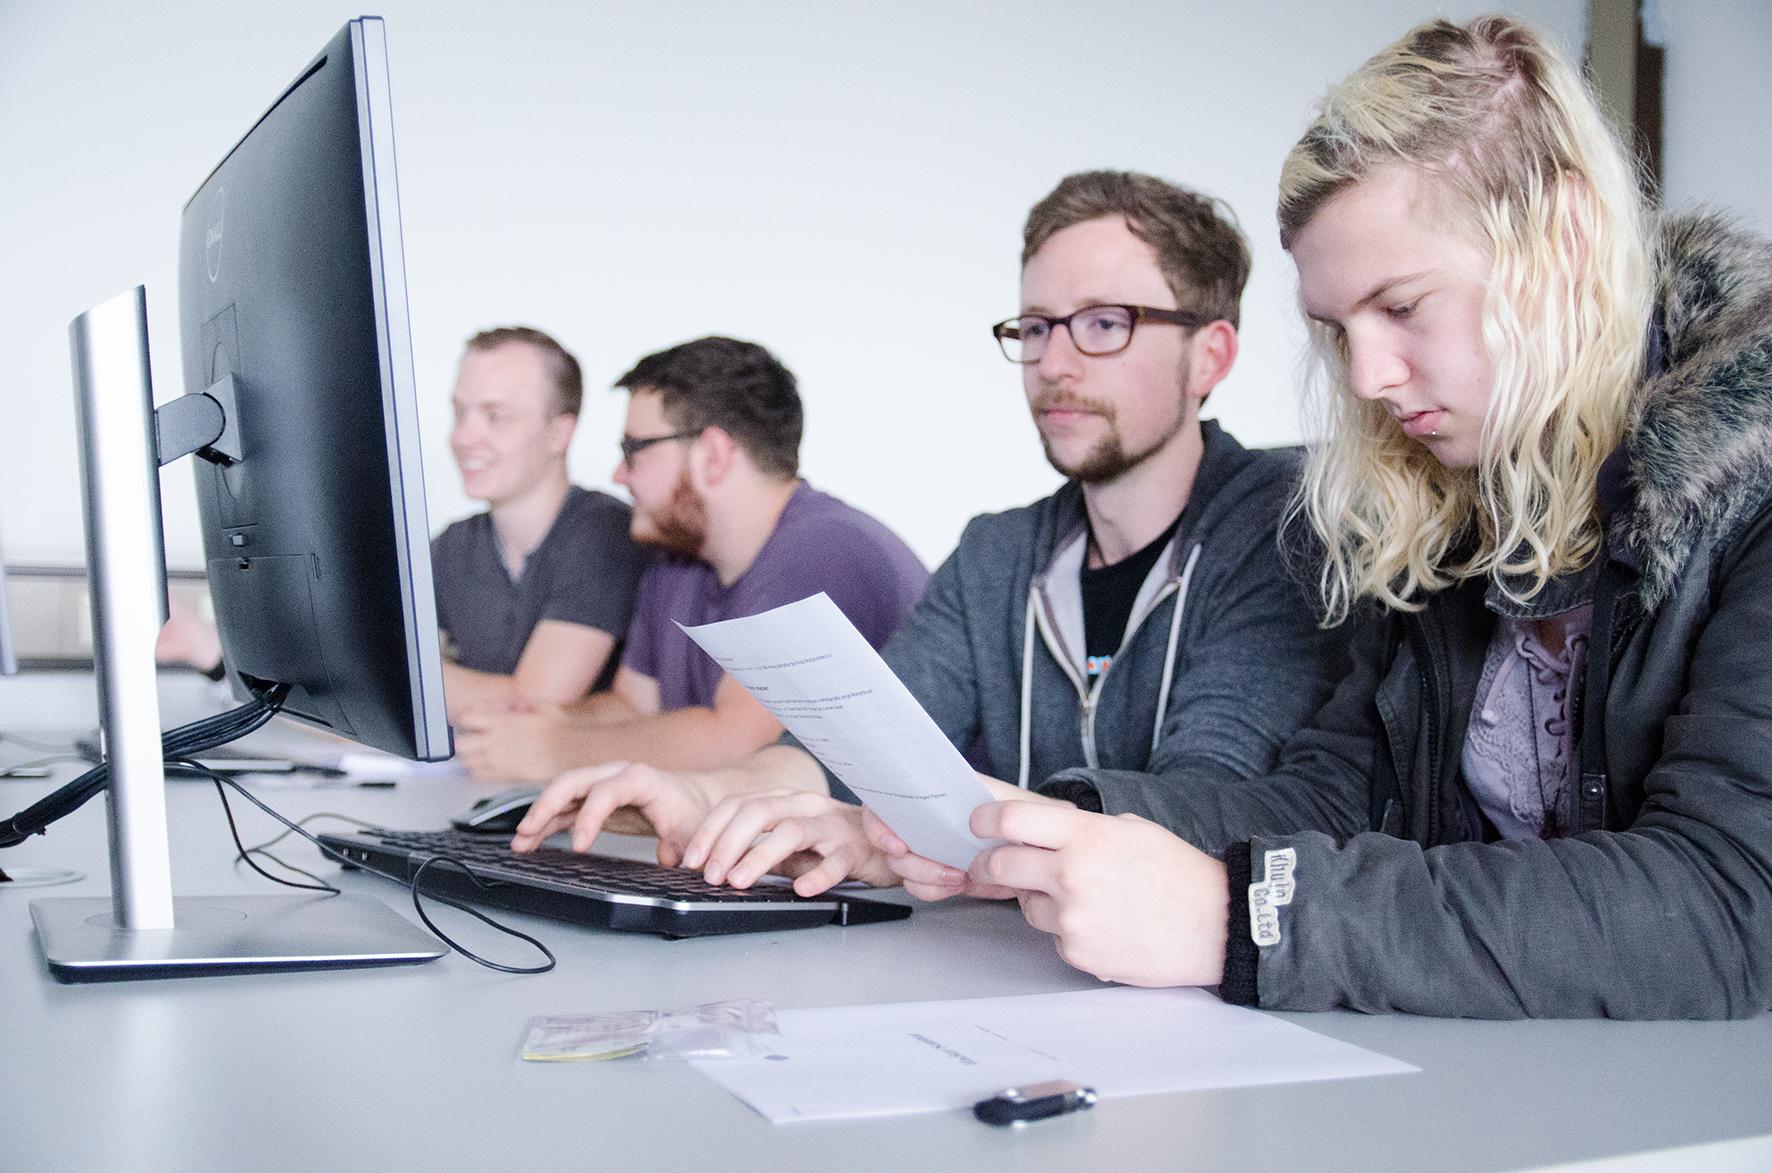 Schülerinnen und Schüler am PC